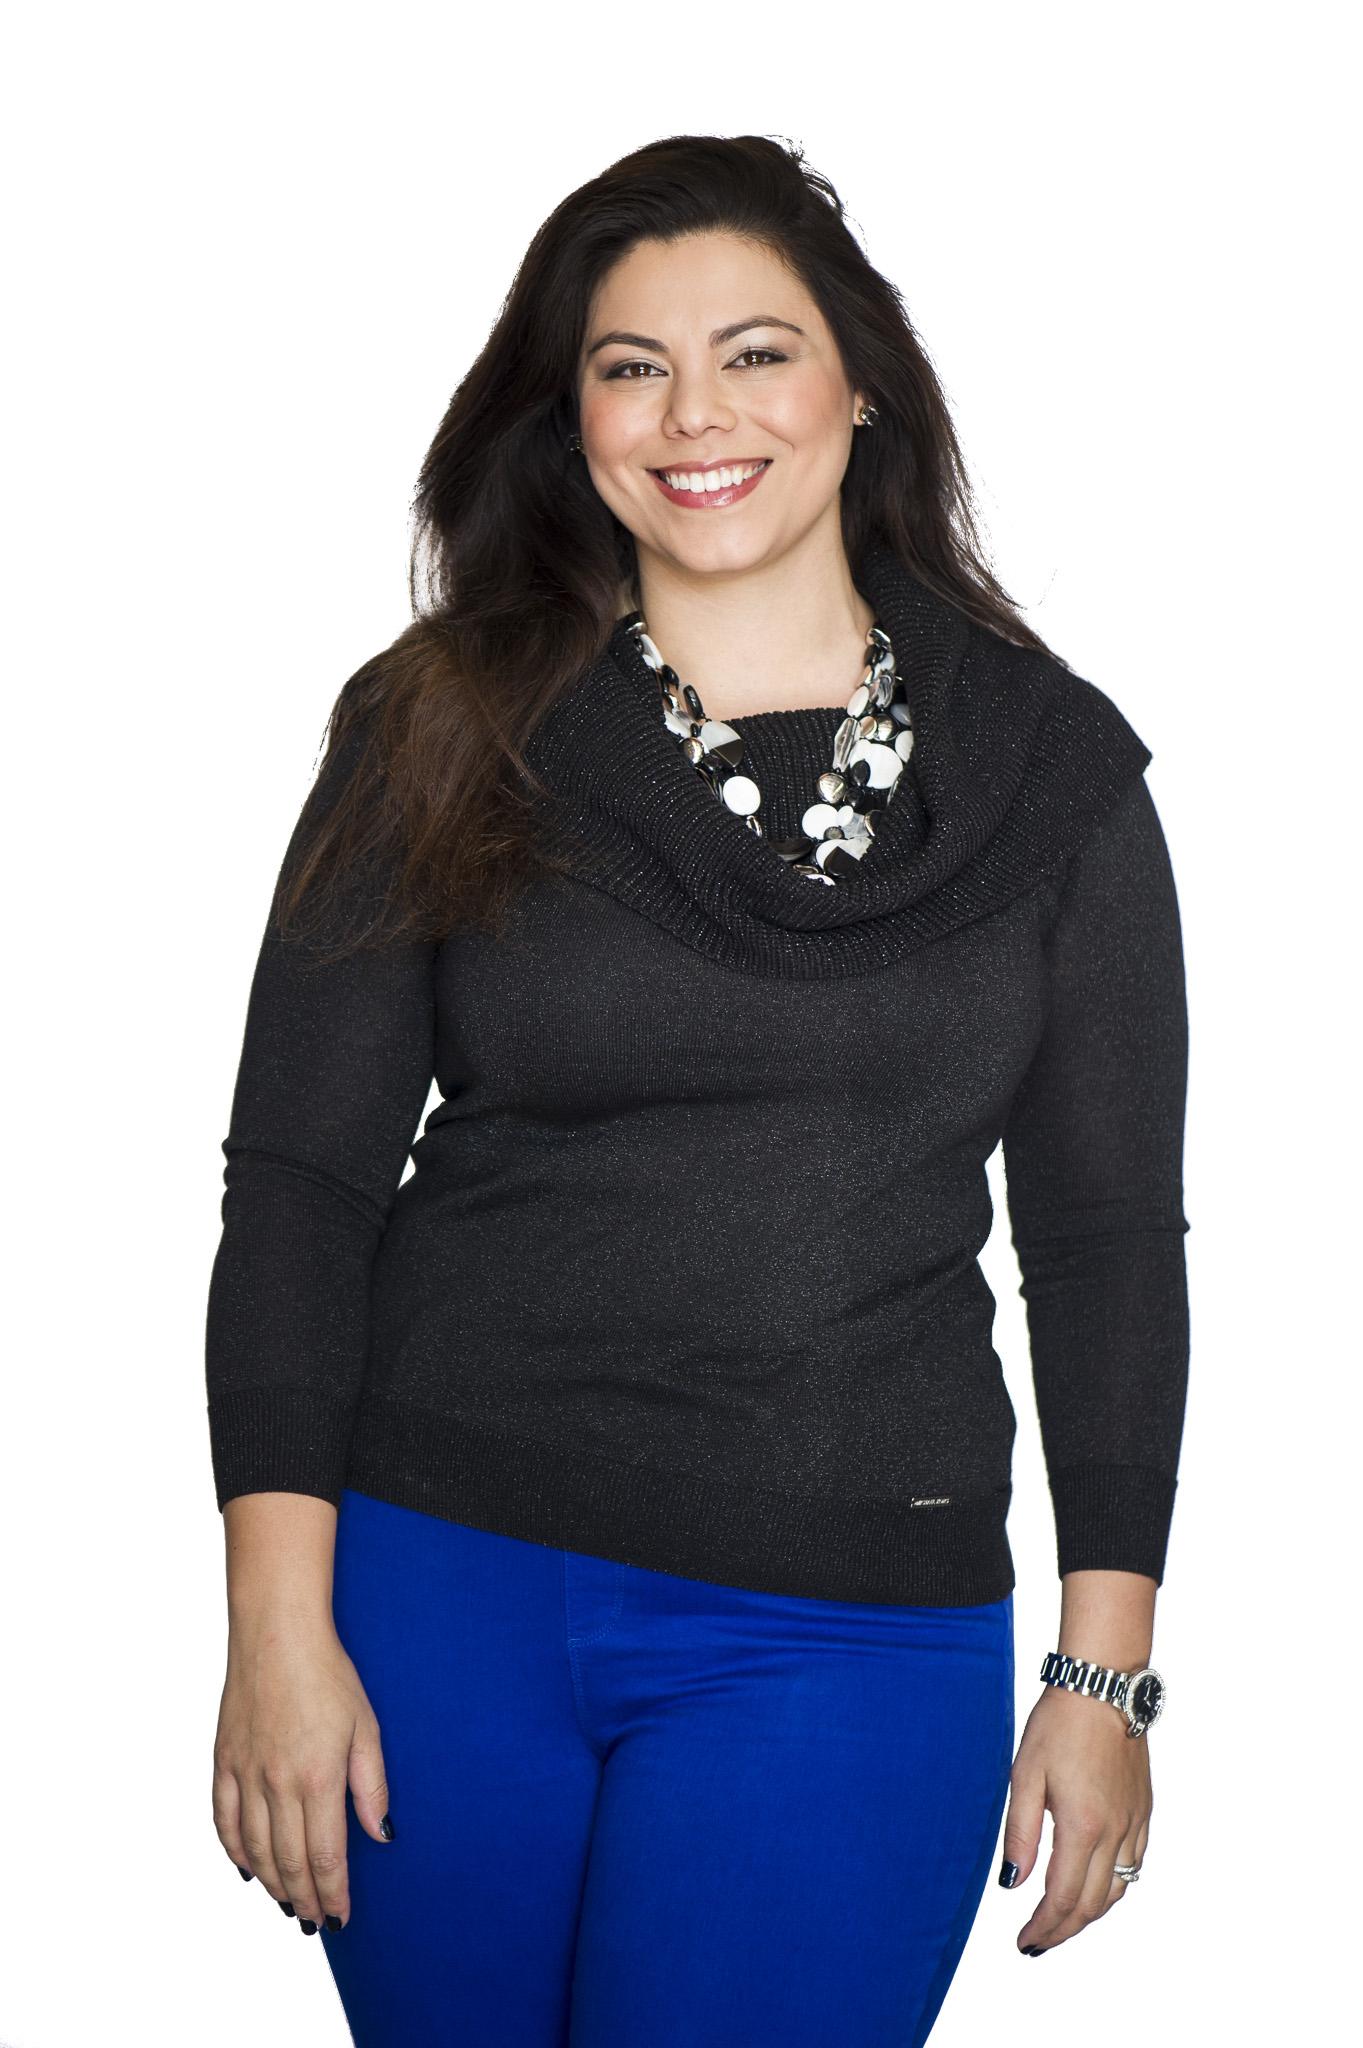 Kimberly Seeherman   Chief Creative Officer